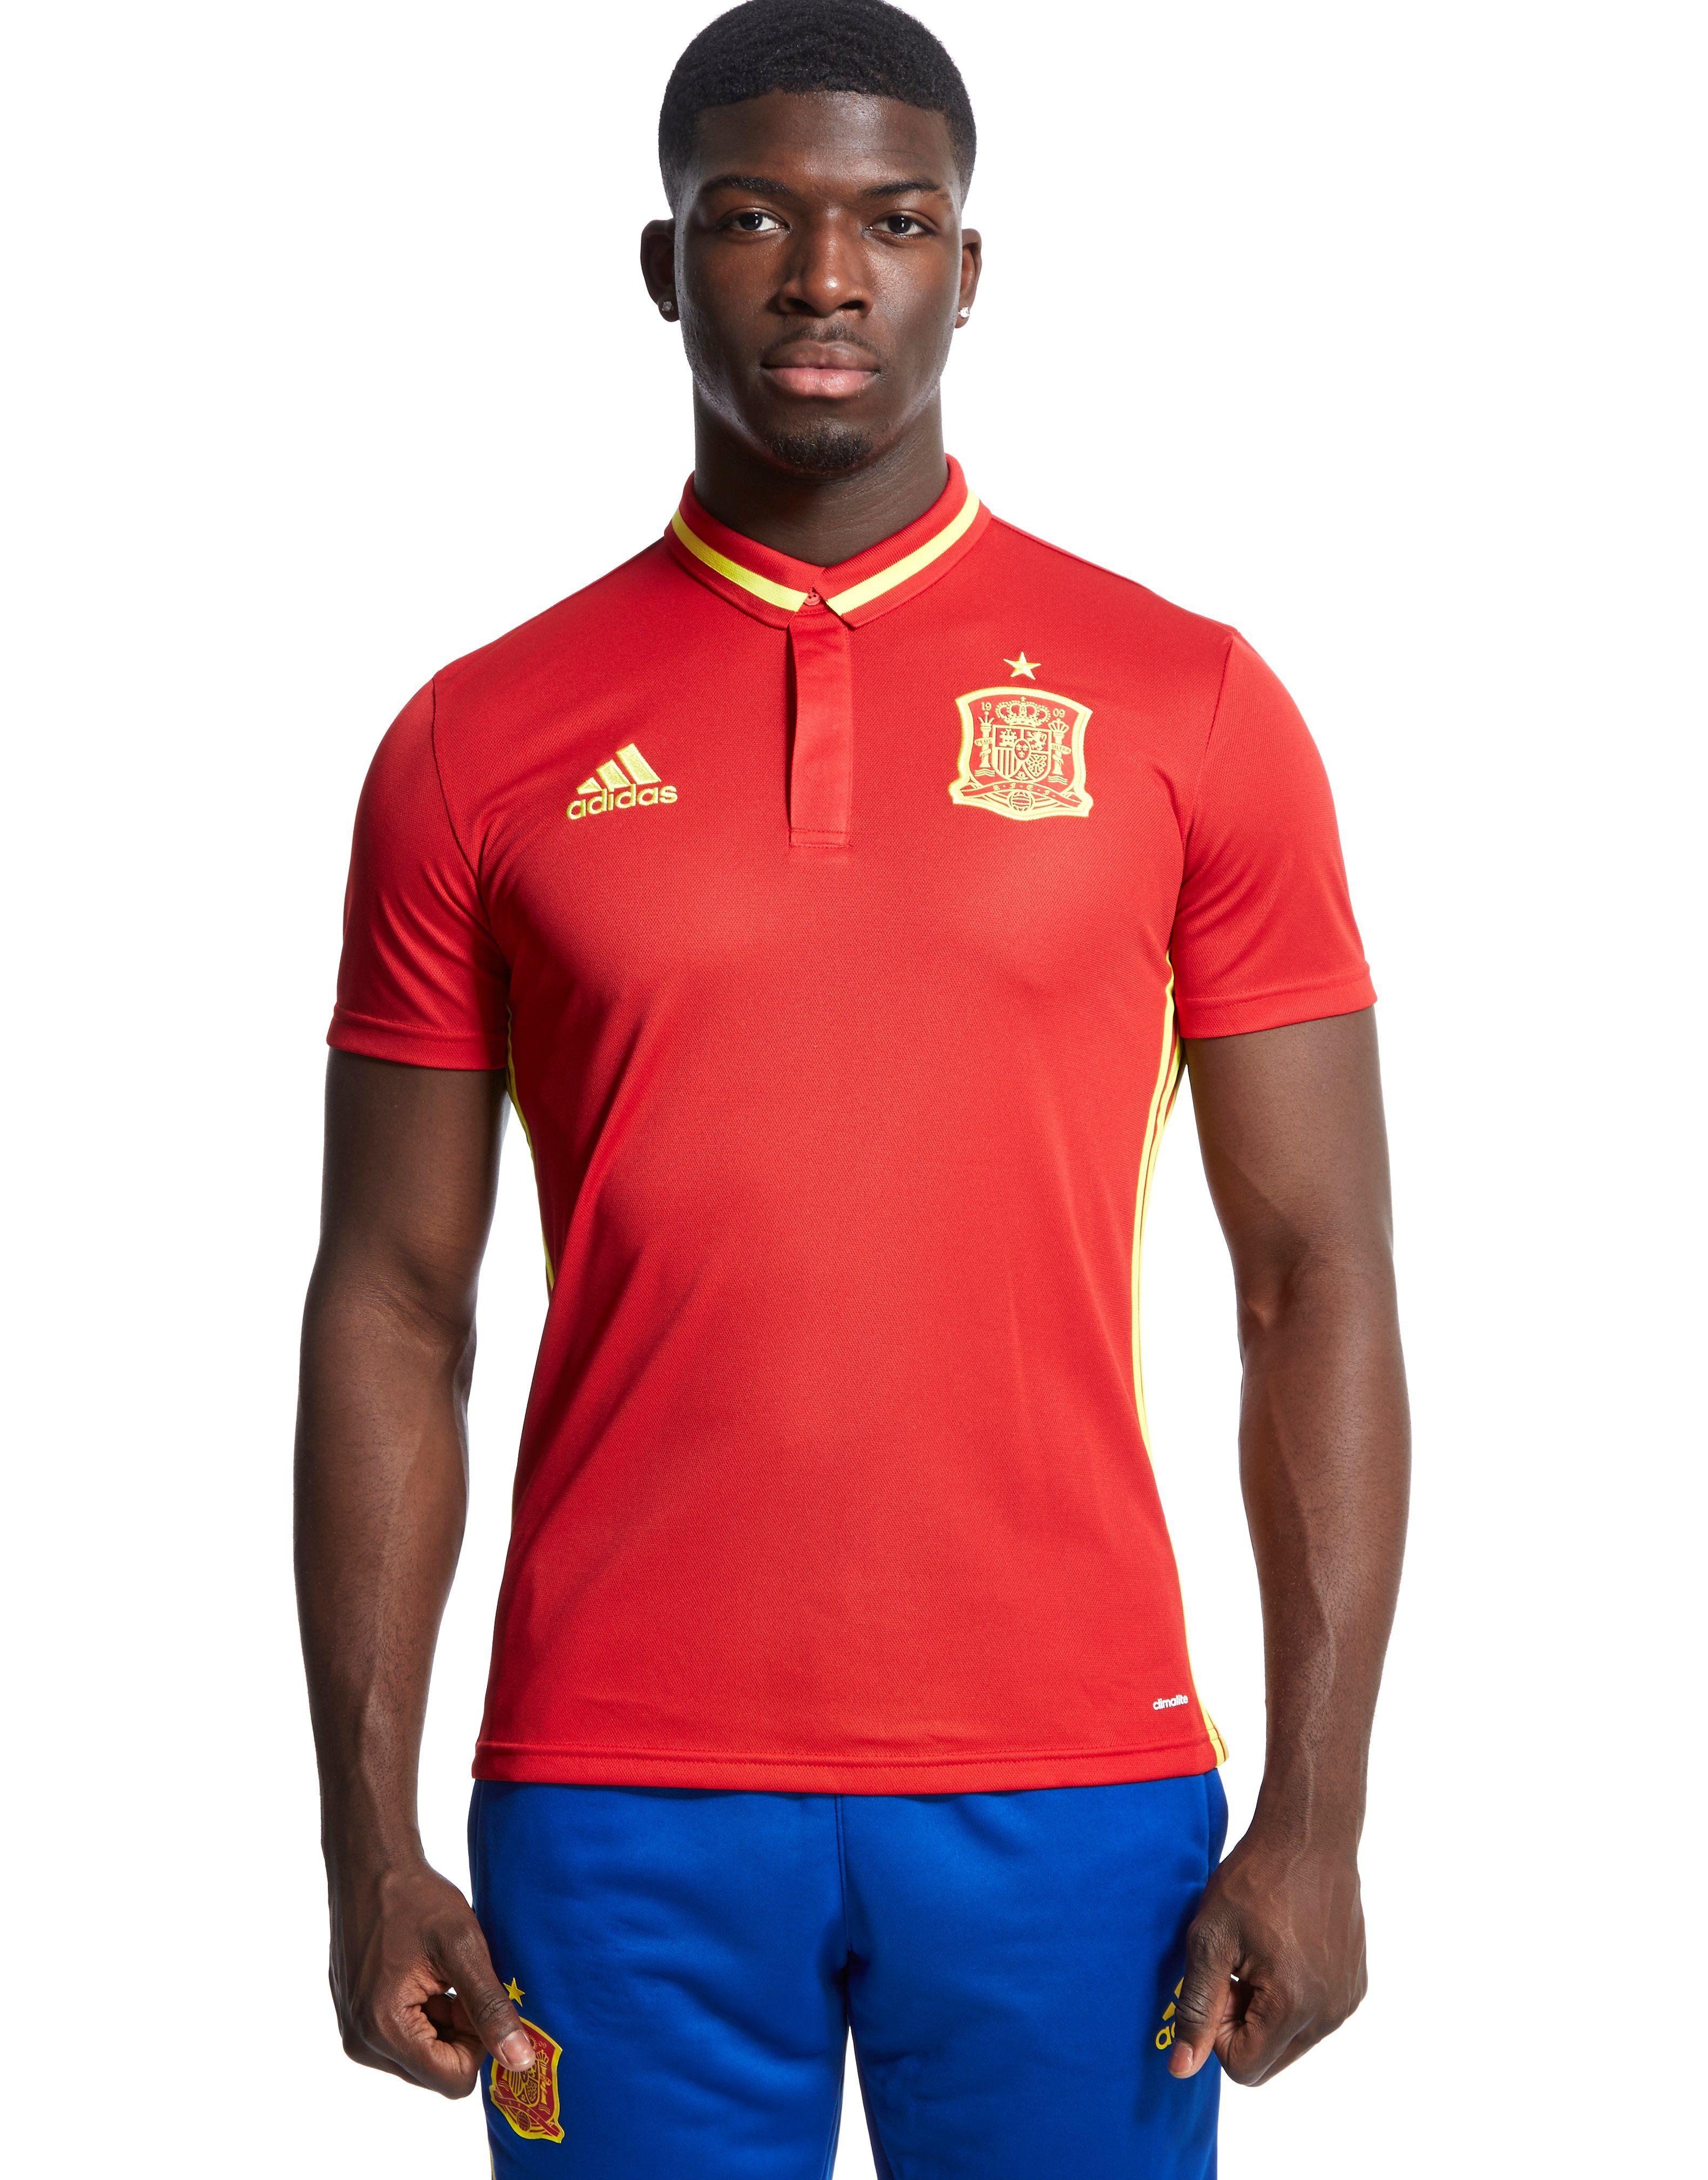 Adidas spain climalite polo shirt jd sports for Spain polo shirt 2014